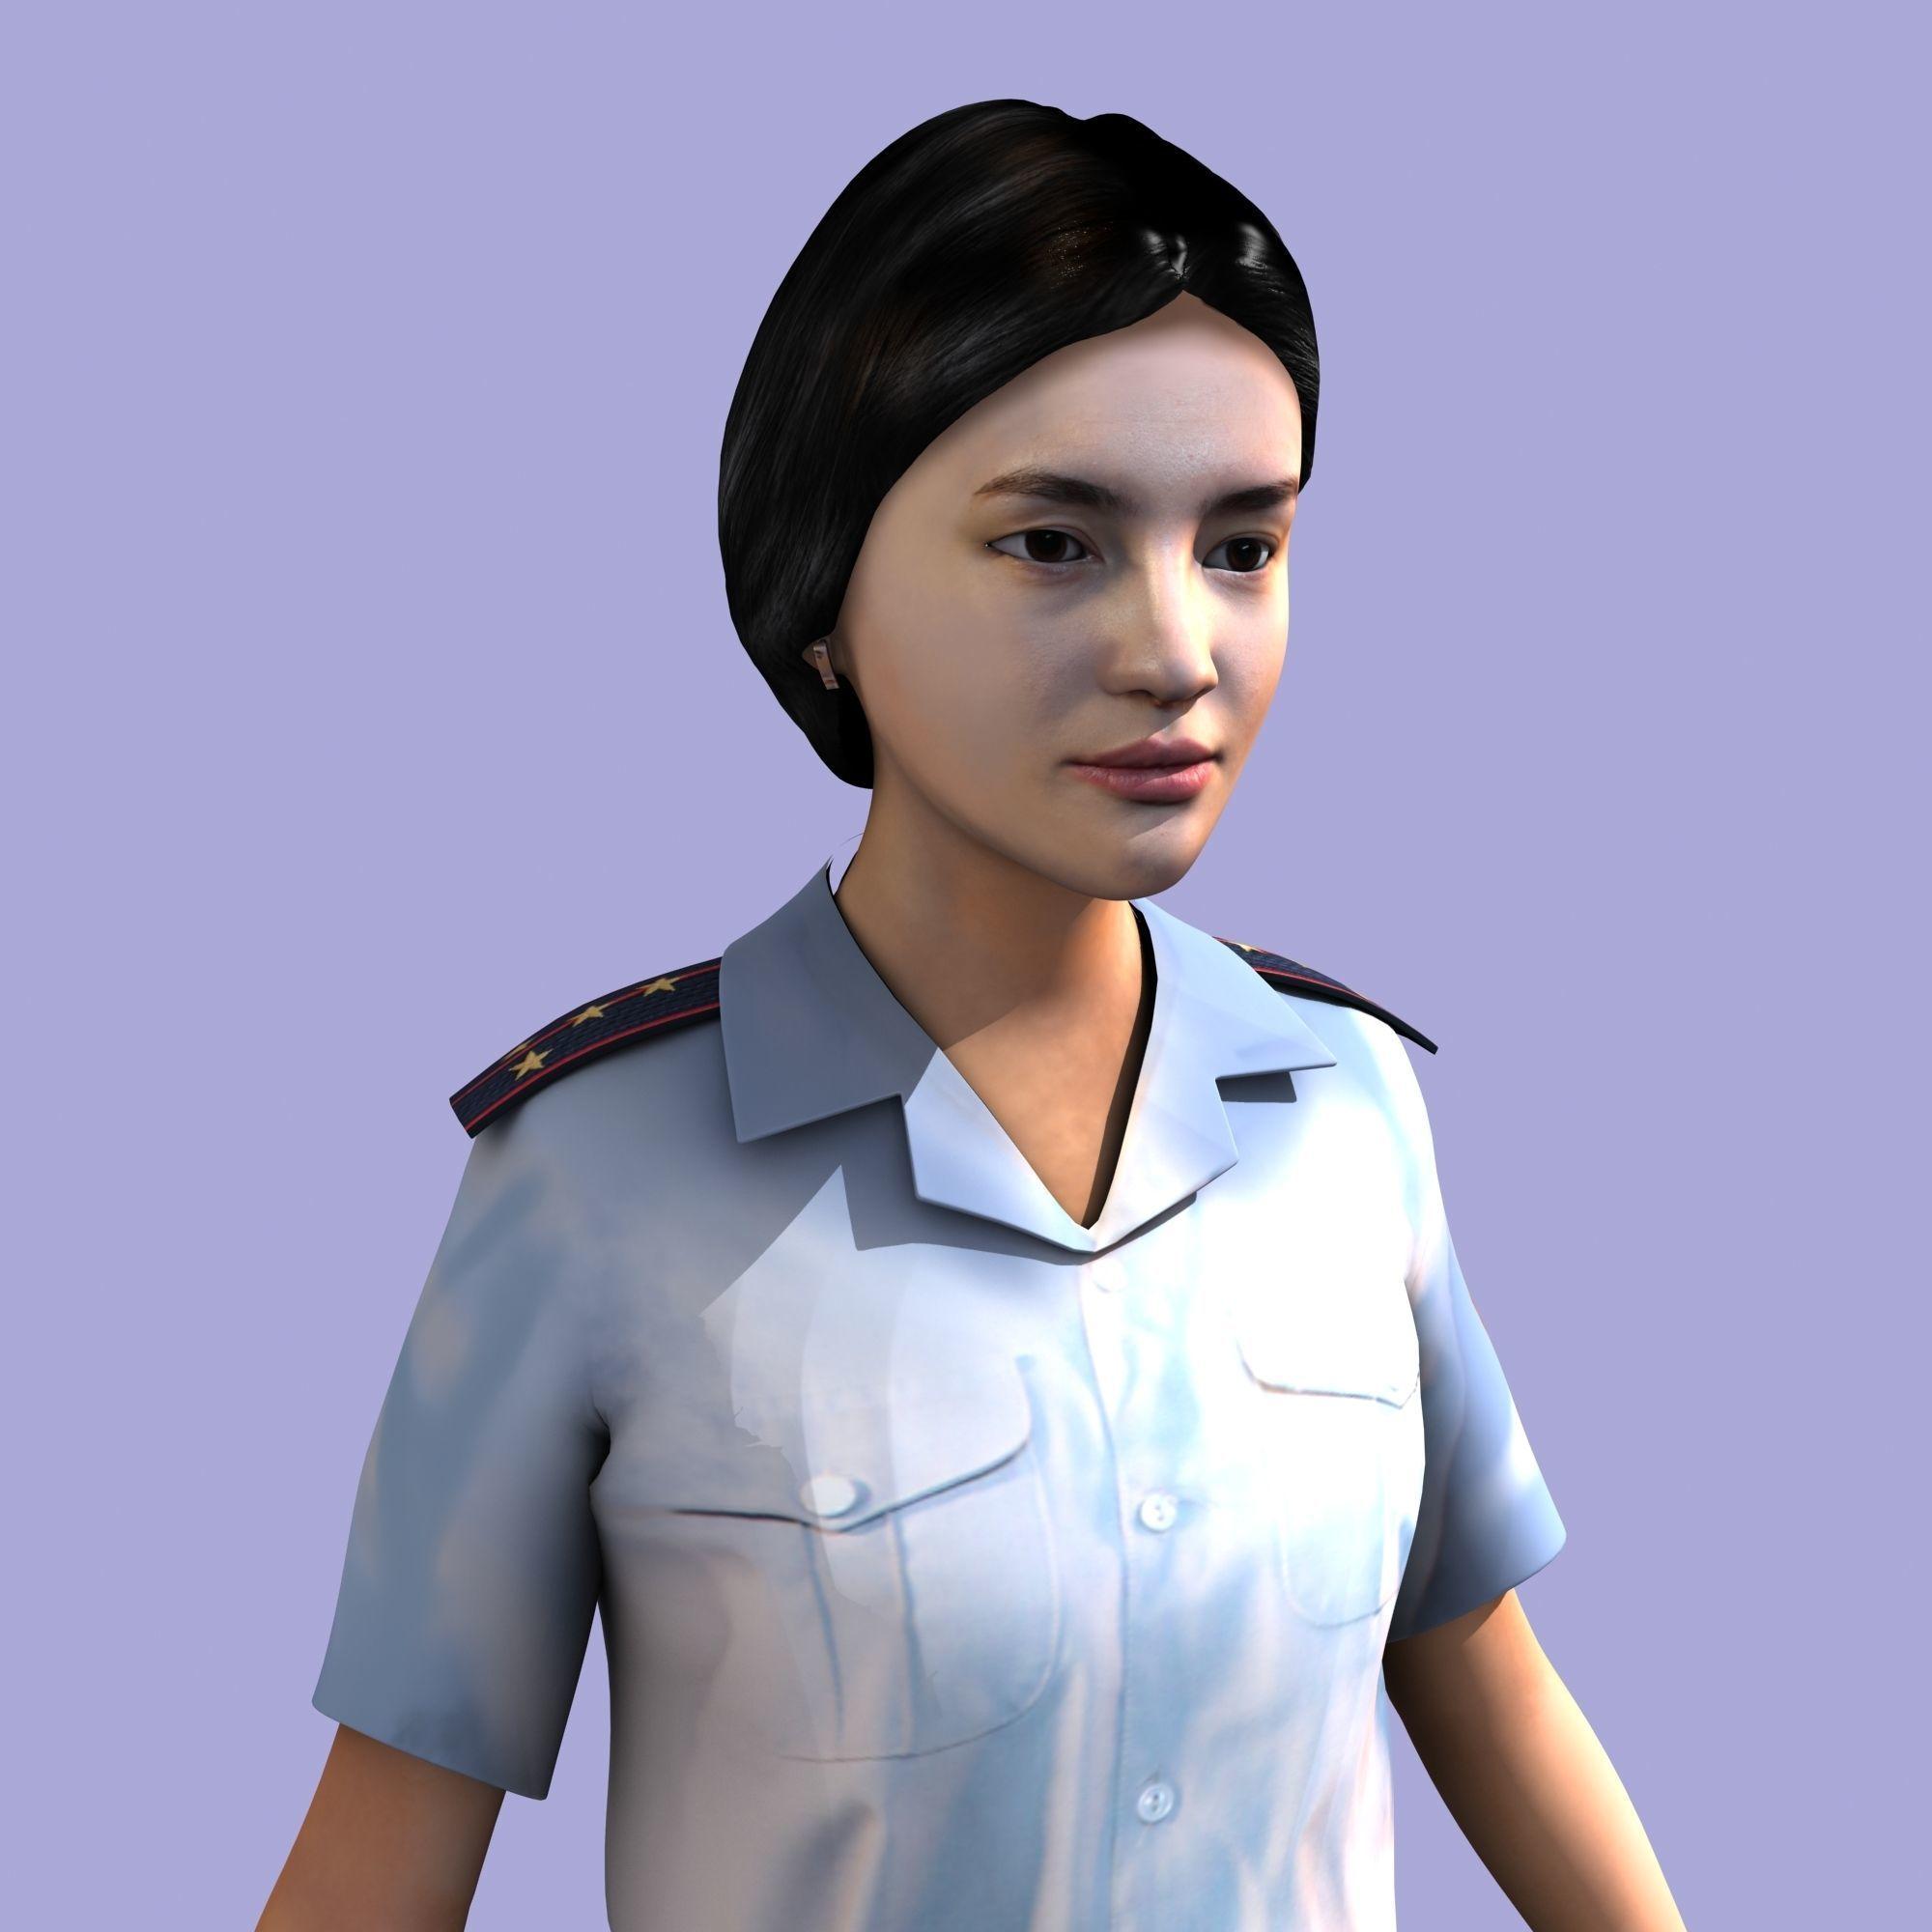 Asian woman - soviet police officer